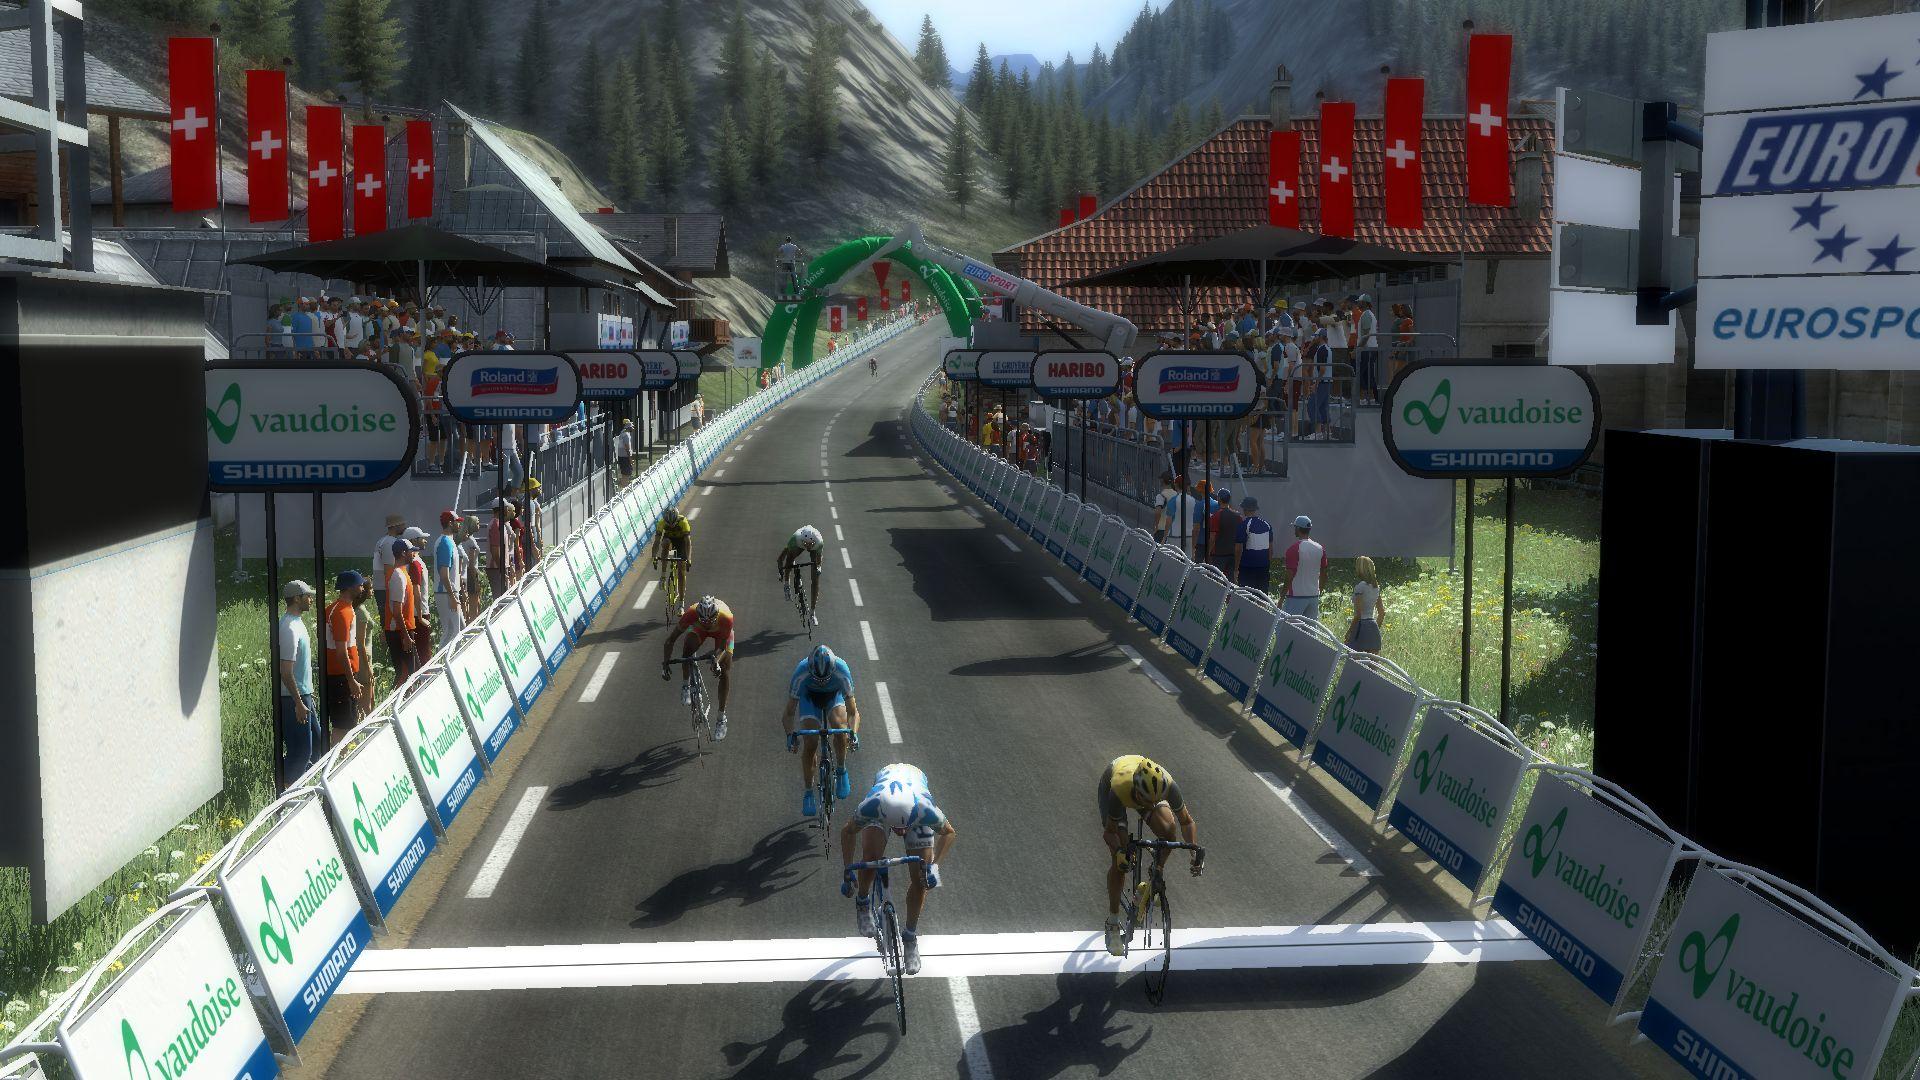 pcmdaily.com/images/mg/2017/Races/U23/Avenir/AVES7%2031.jpg